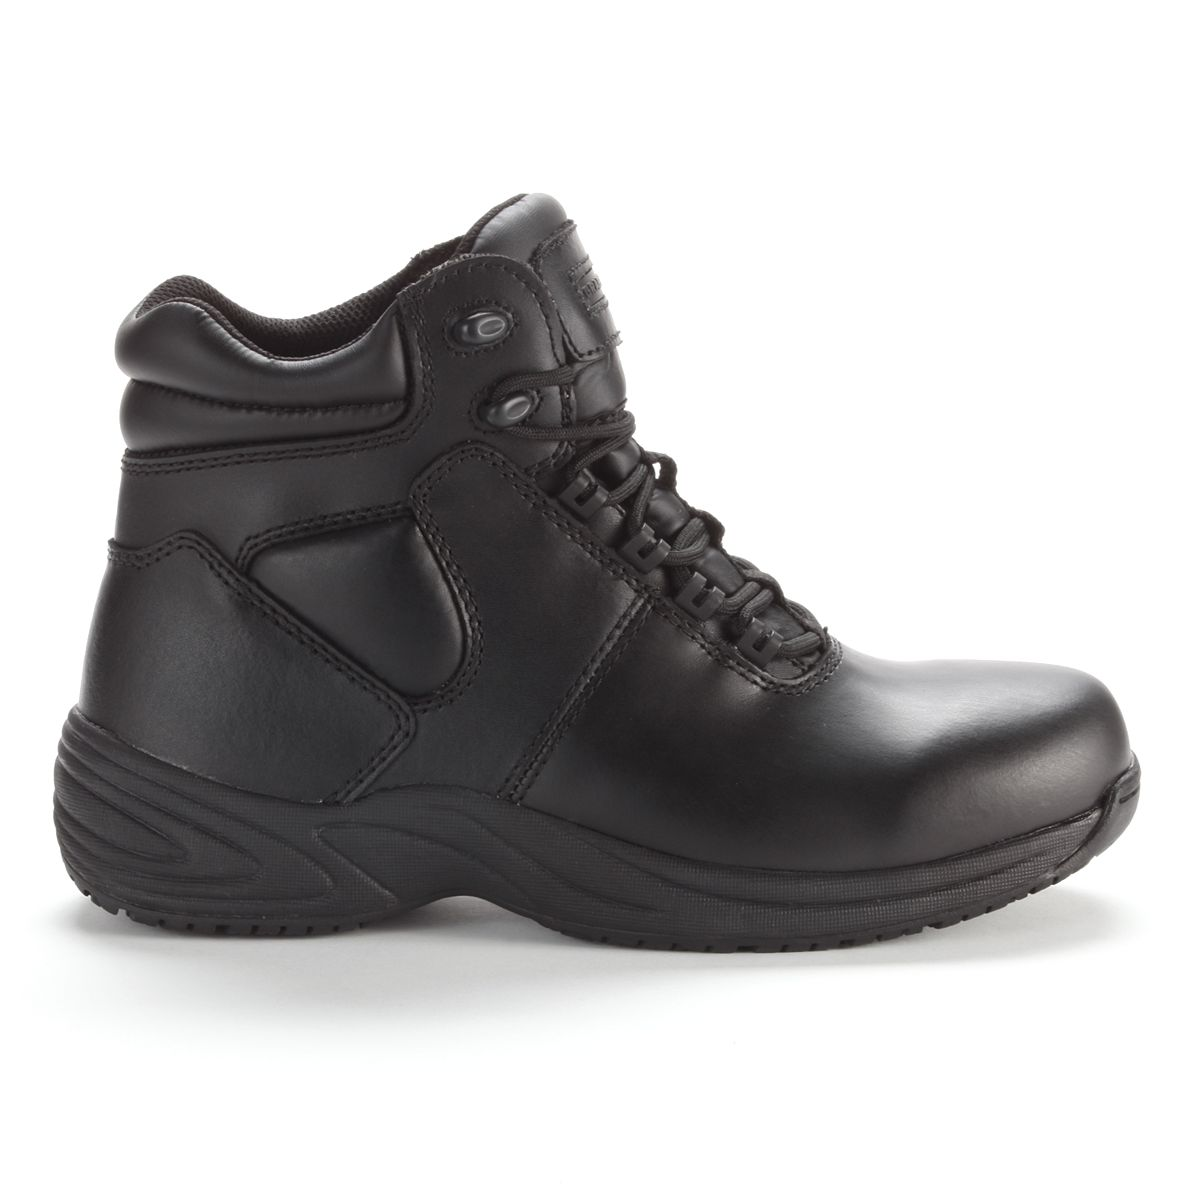 Grabbers Fastener Sport Men's Slip-Resistant Work Boots lpexj